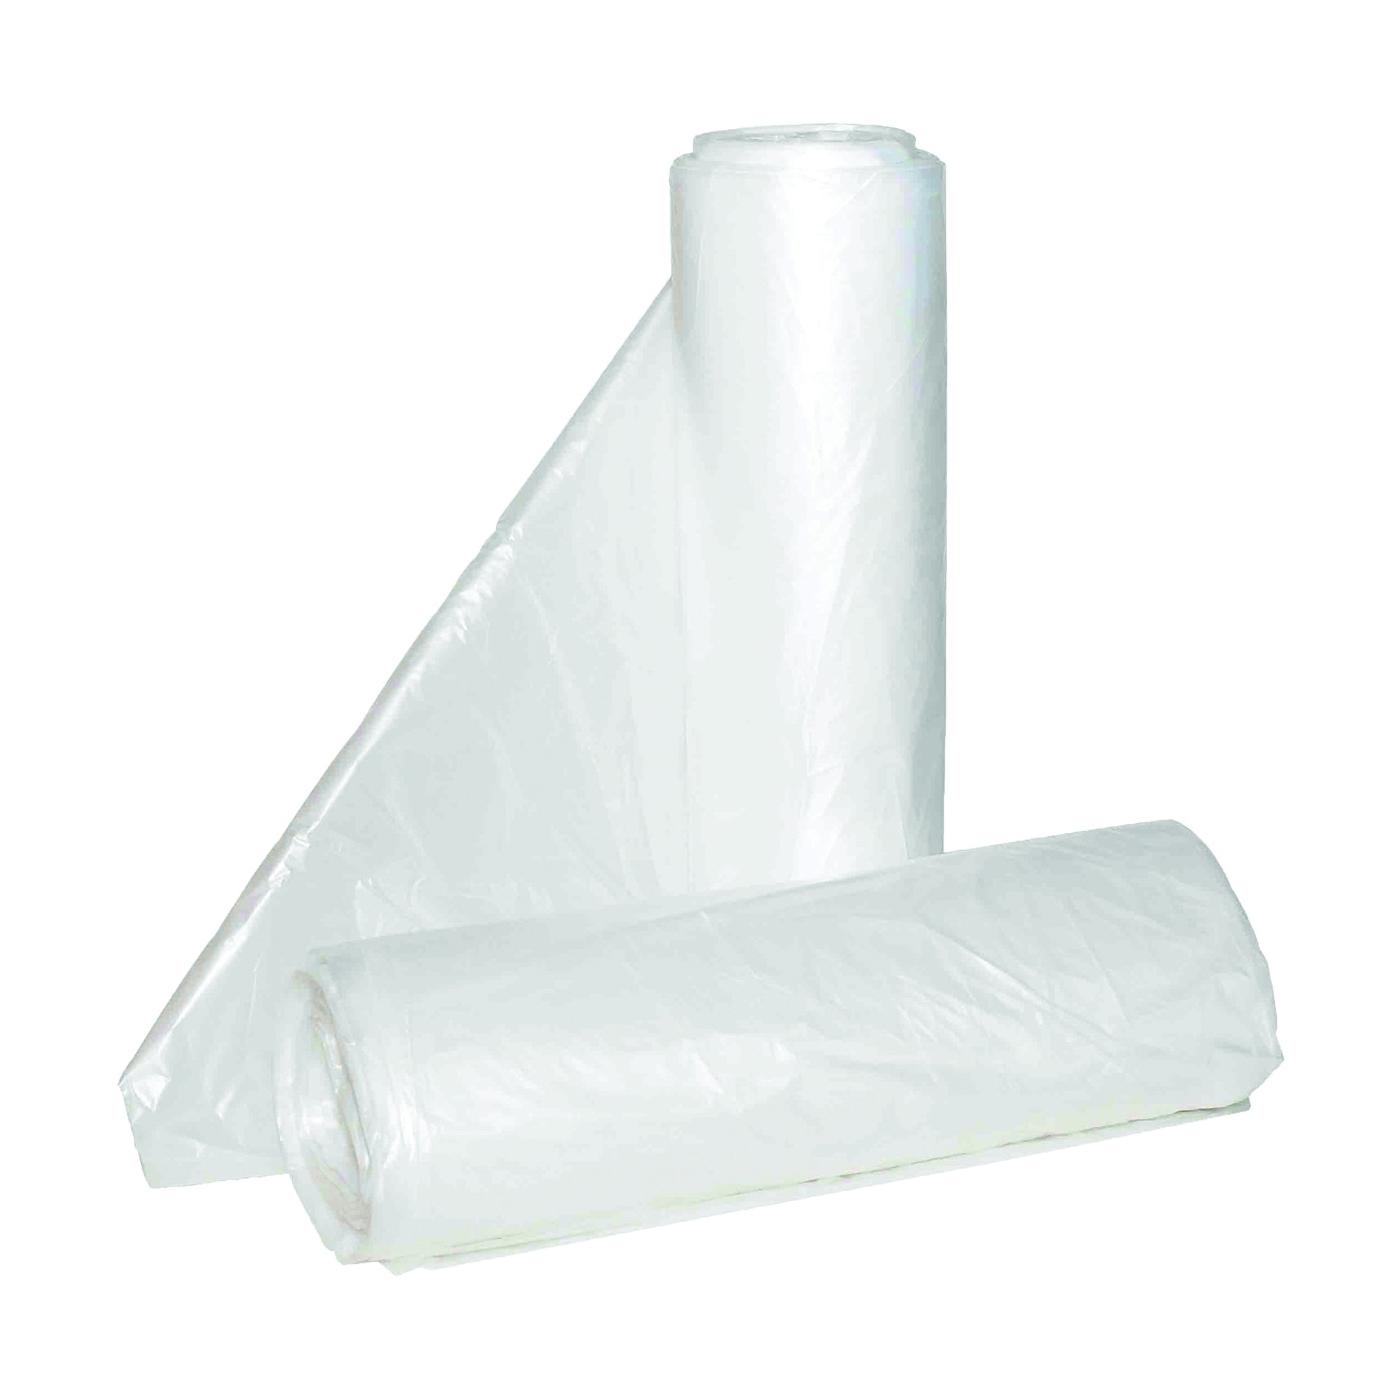 Picture of ALUF PLASTICS Hi-Lene HC HC-404814C Can Liner, 45 gal Capacity, Polyethylene, Clear